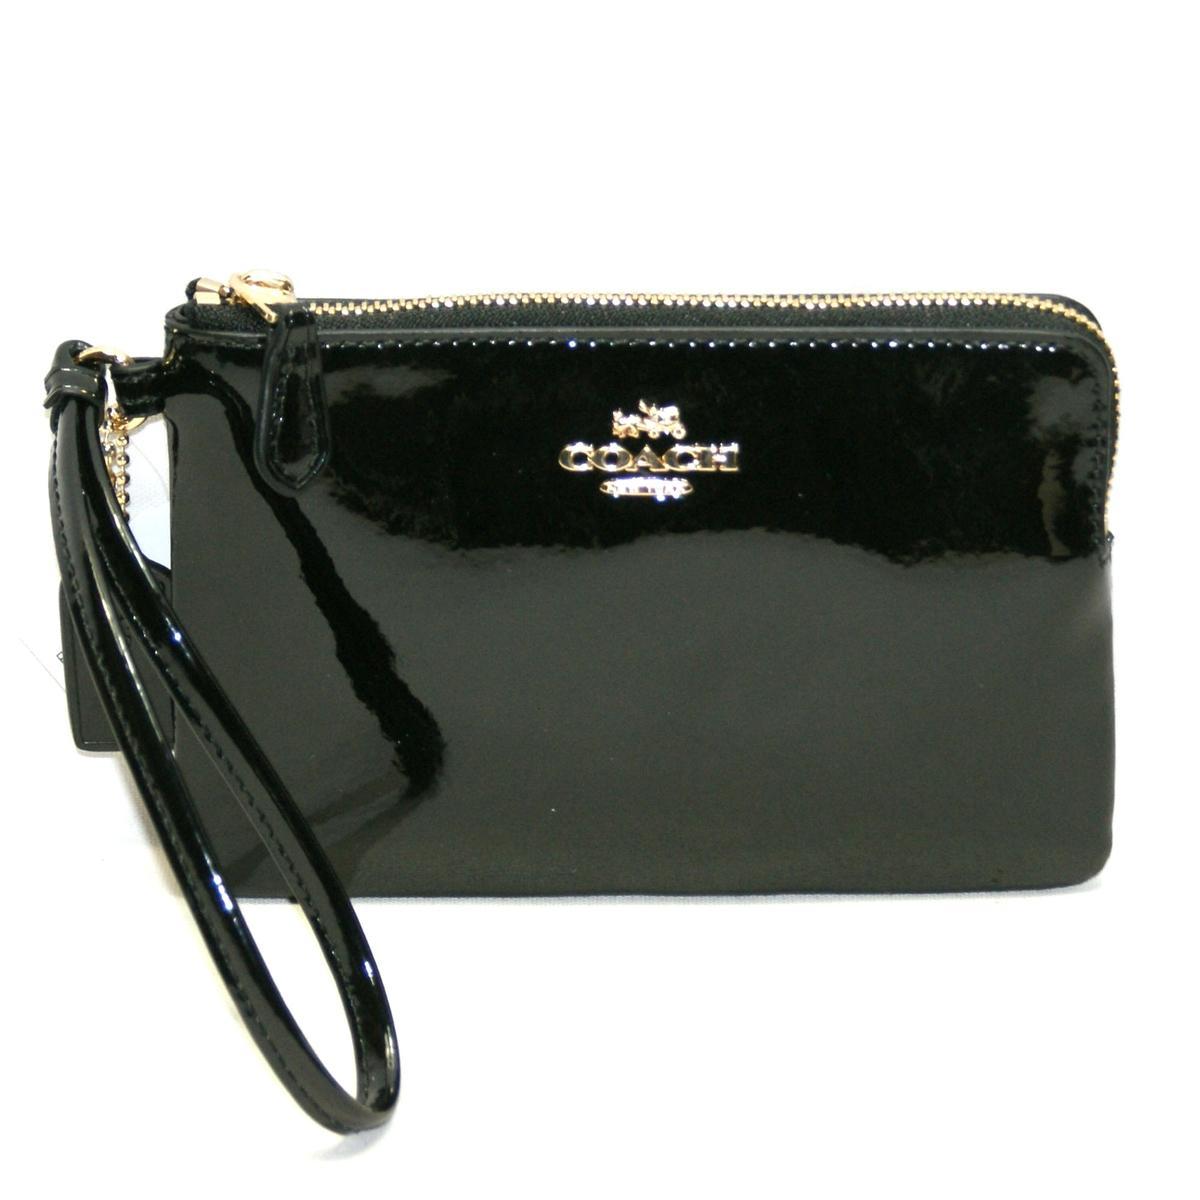 1c4baf67145c7 ... where can i buy coach corner zip patent leather black wristlet 55739  coach 55739 99de7 a1dbe